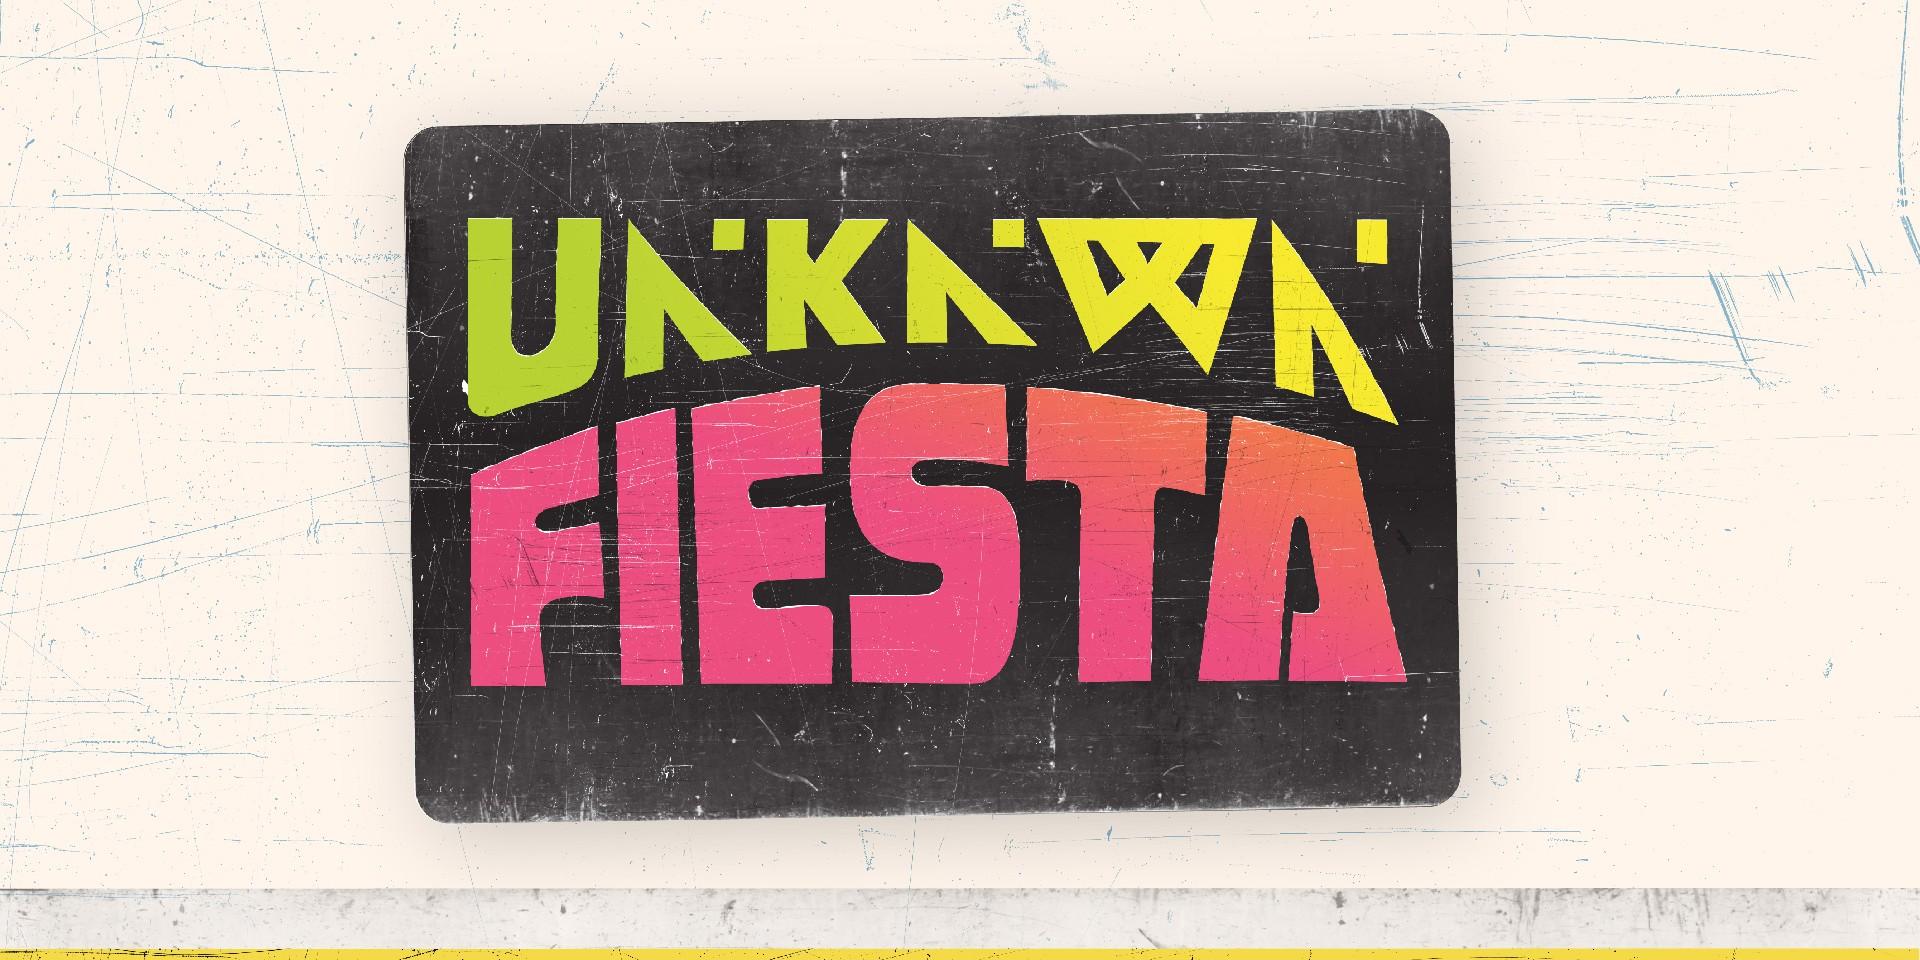 UNKNWN.Fiesta has been postponed